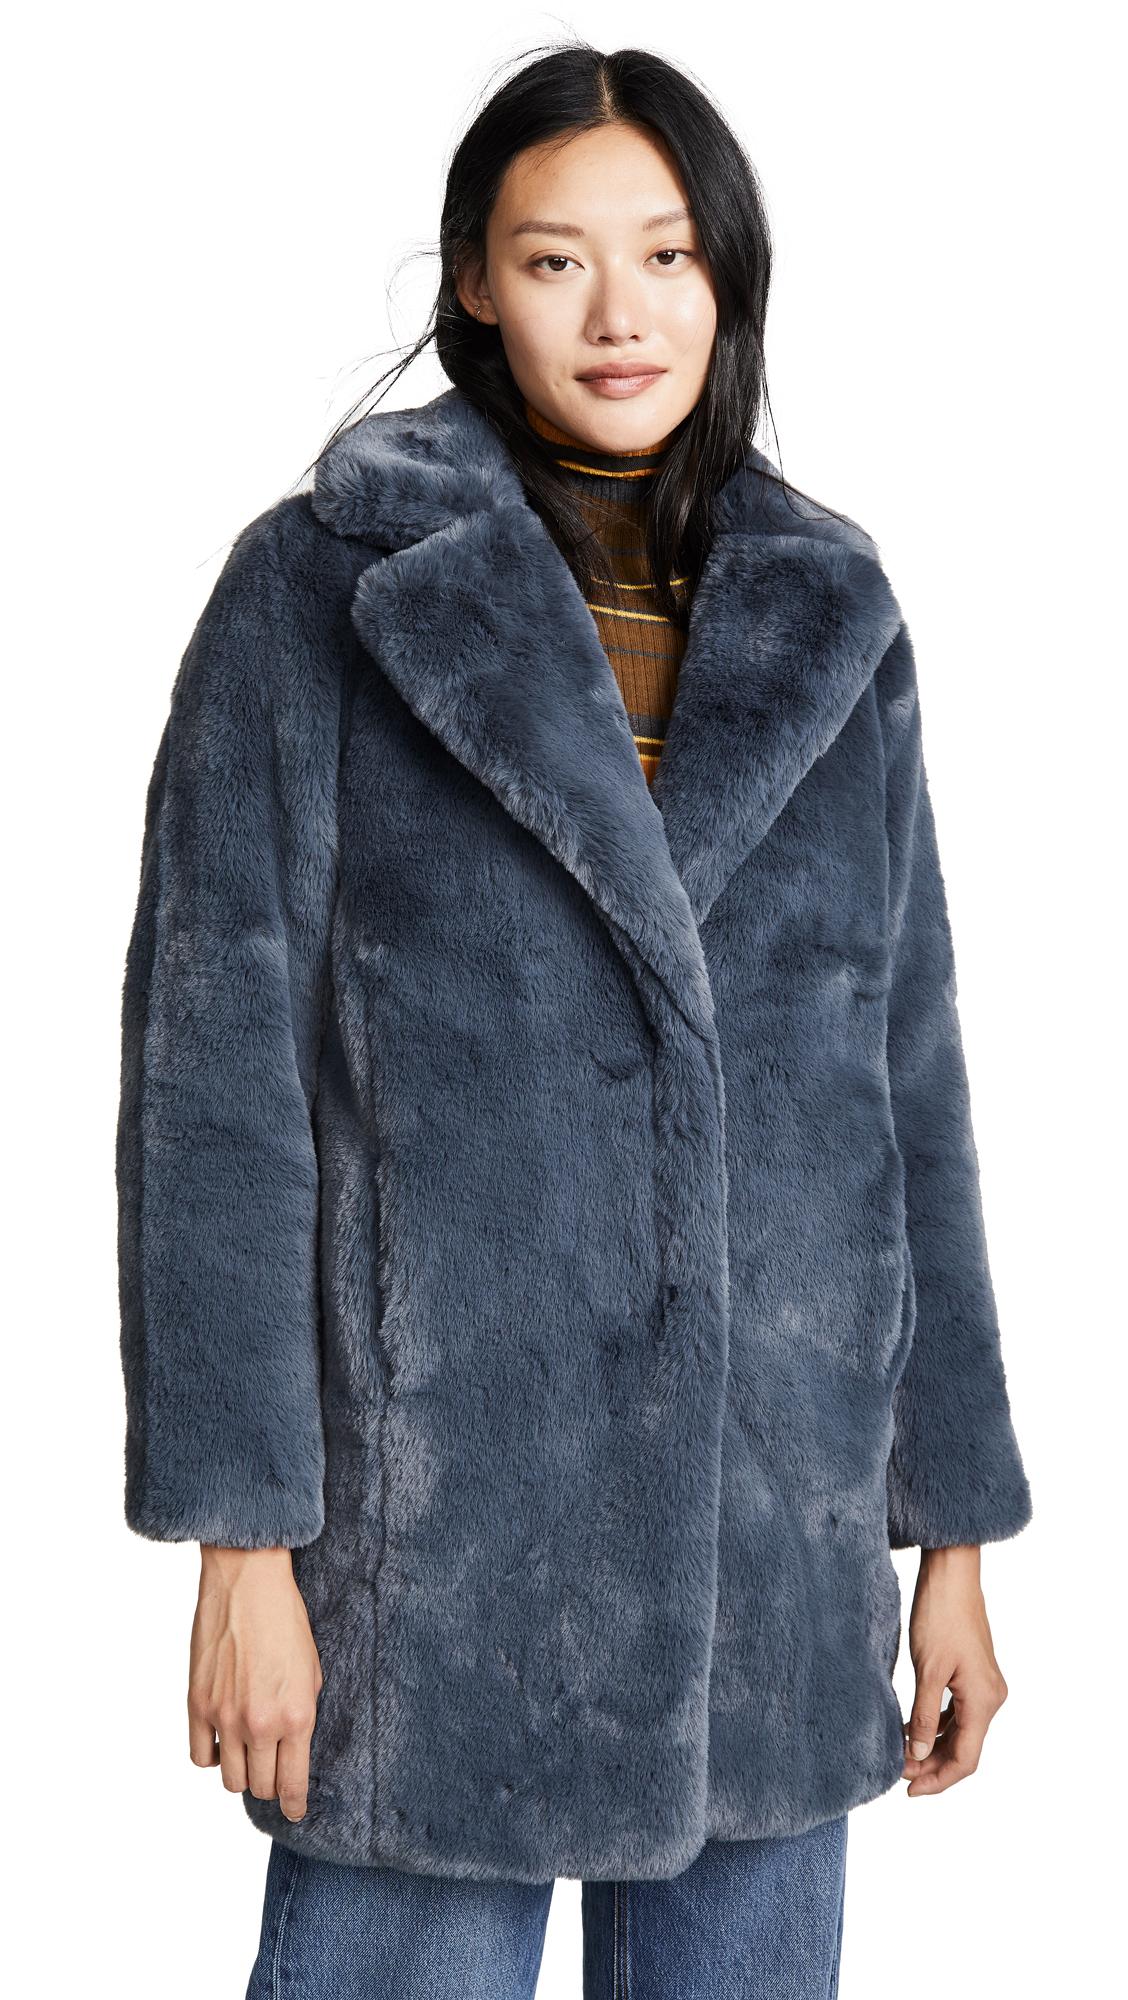 MKT STUDIO Marili Faux Fur Coat in Blue Denim